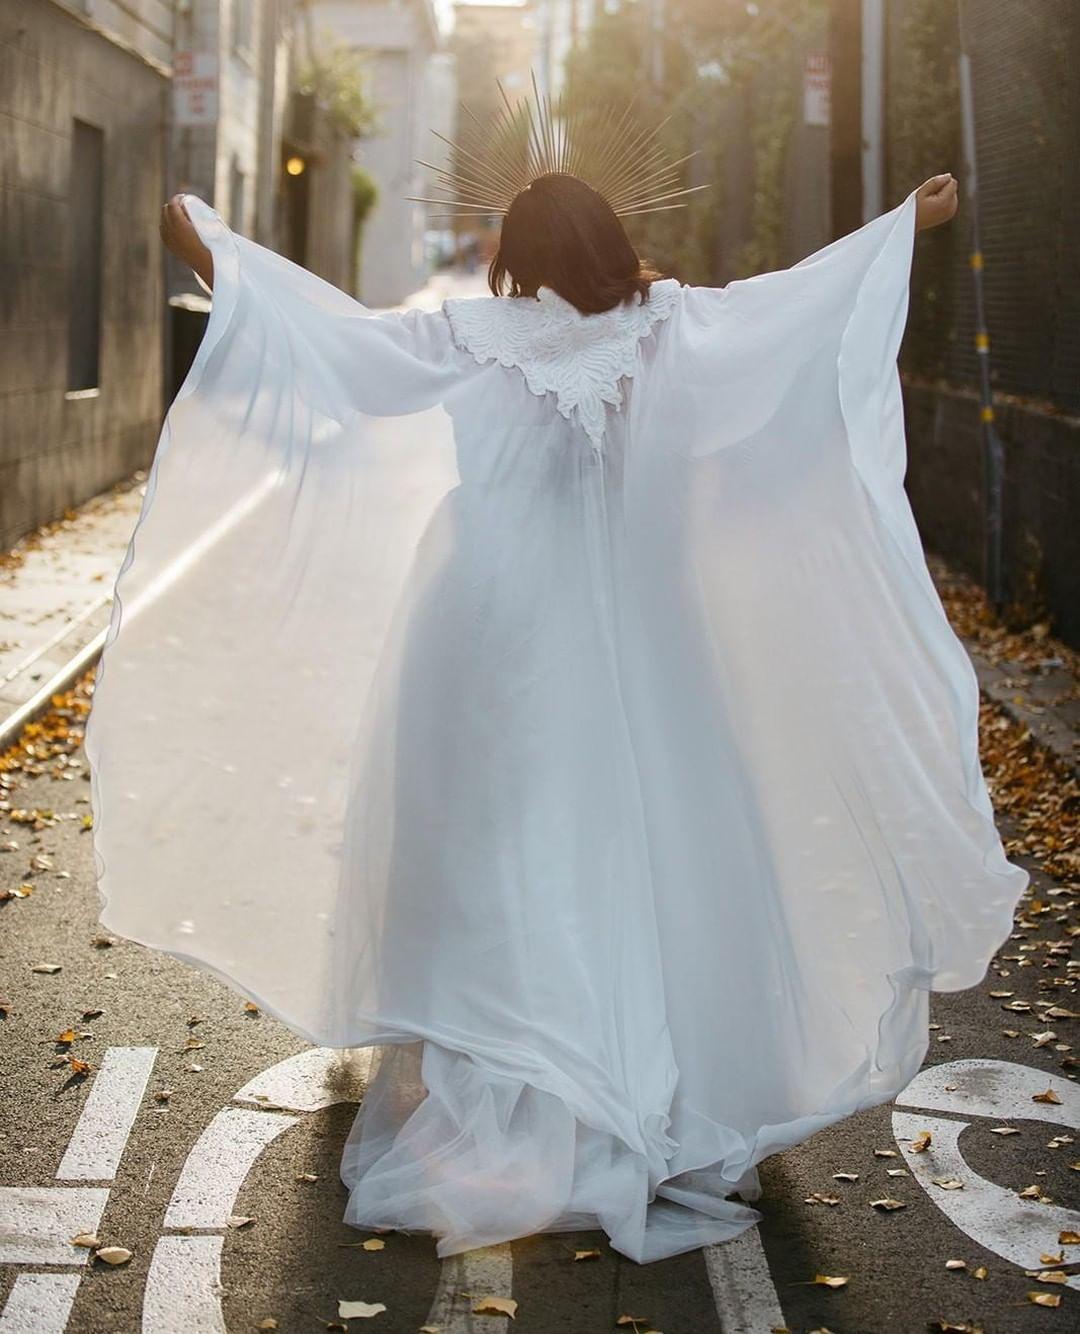 A Practical Wedding Apracticalwedding Instagram Photos And Videos Plus Size Wedding Wedding Dresses Practical Wedding